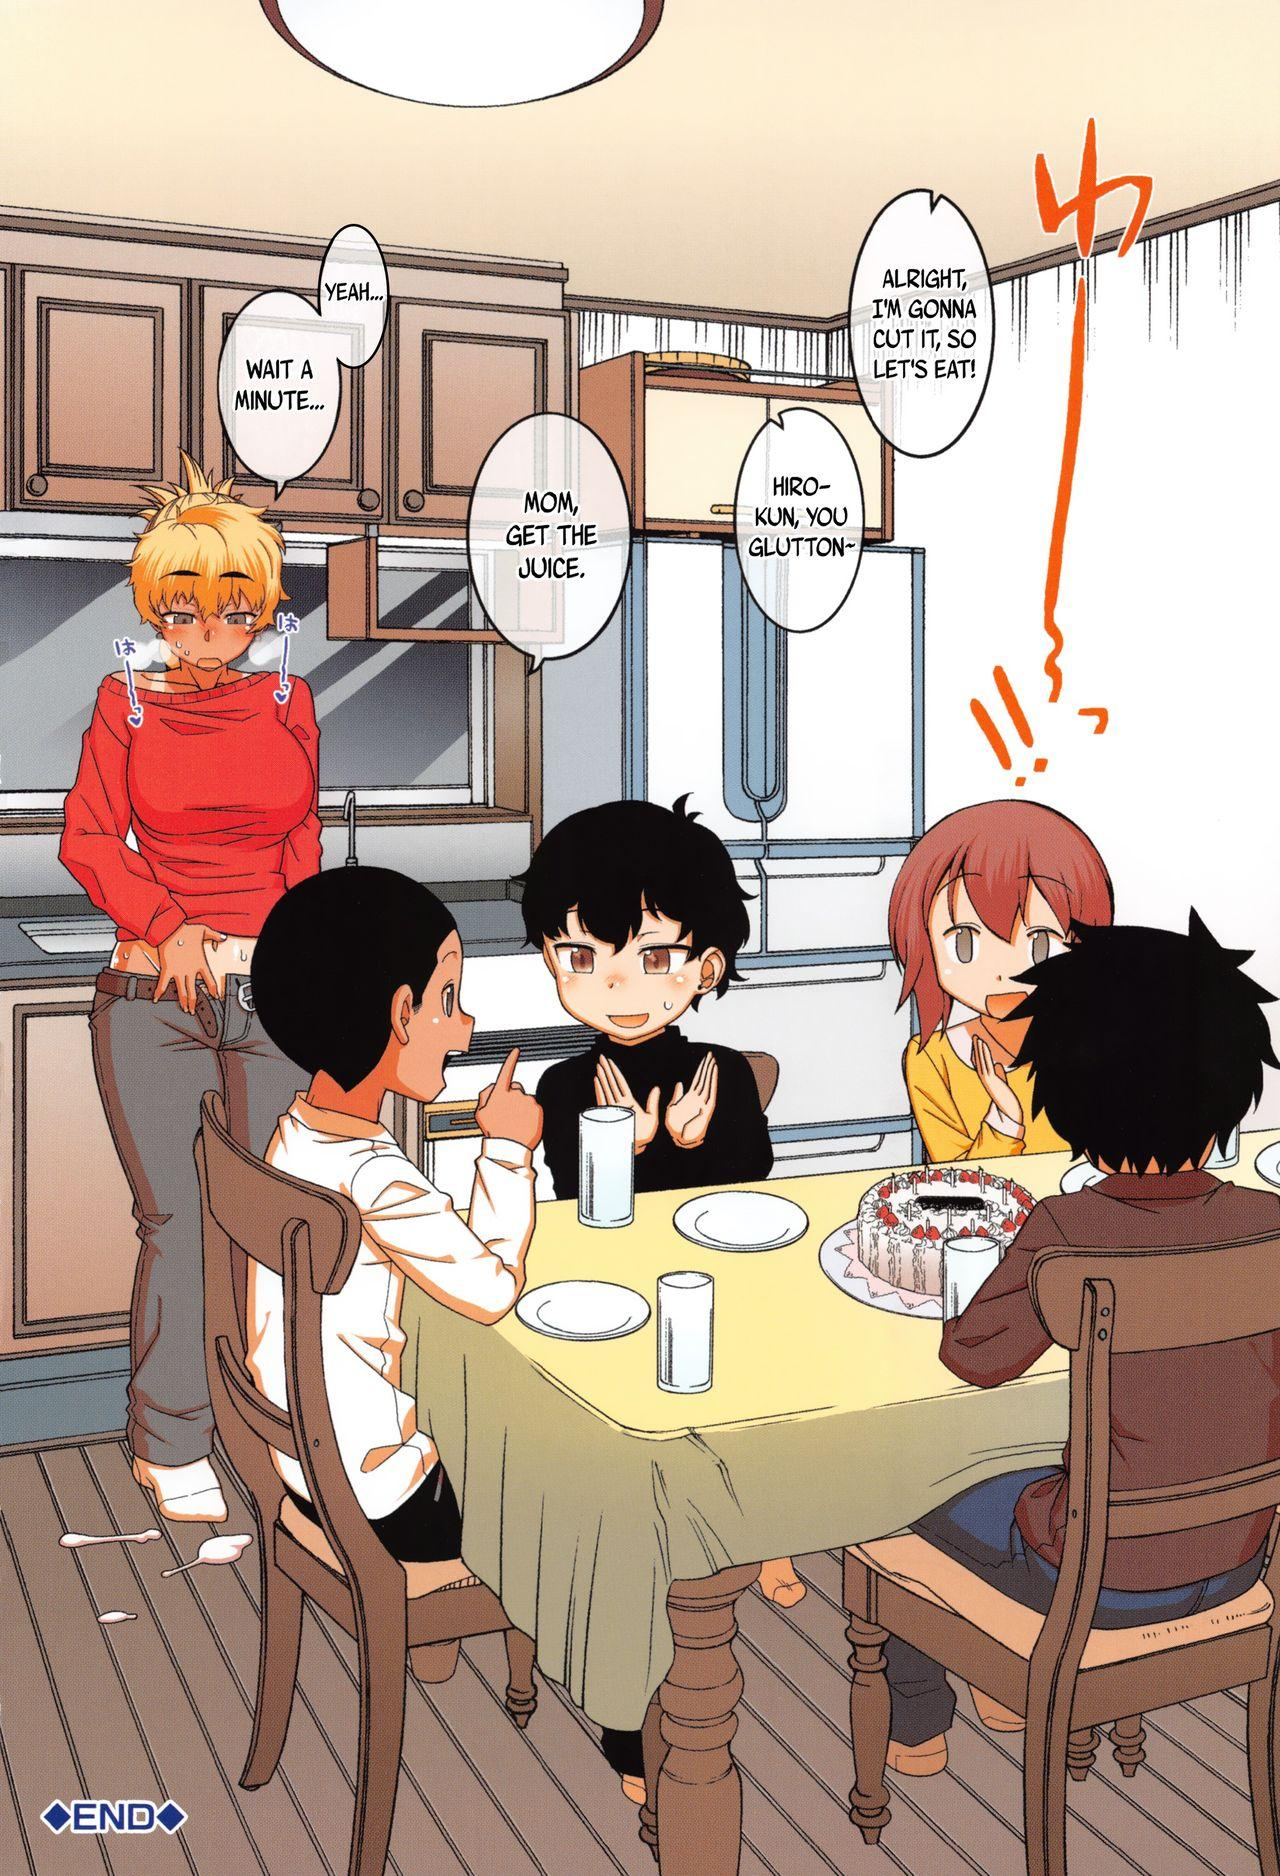 [Takatsu] Hitozuma A-san to Musuko no Yuujin N-kun - Married wife A and son's friend N-kun [English] 7